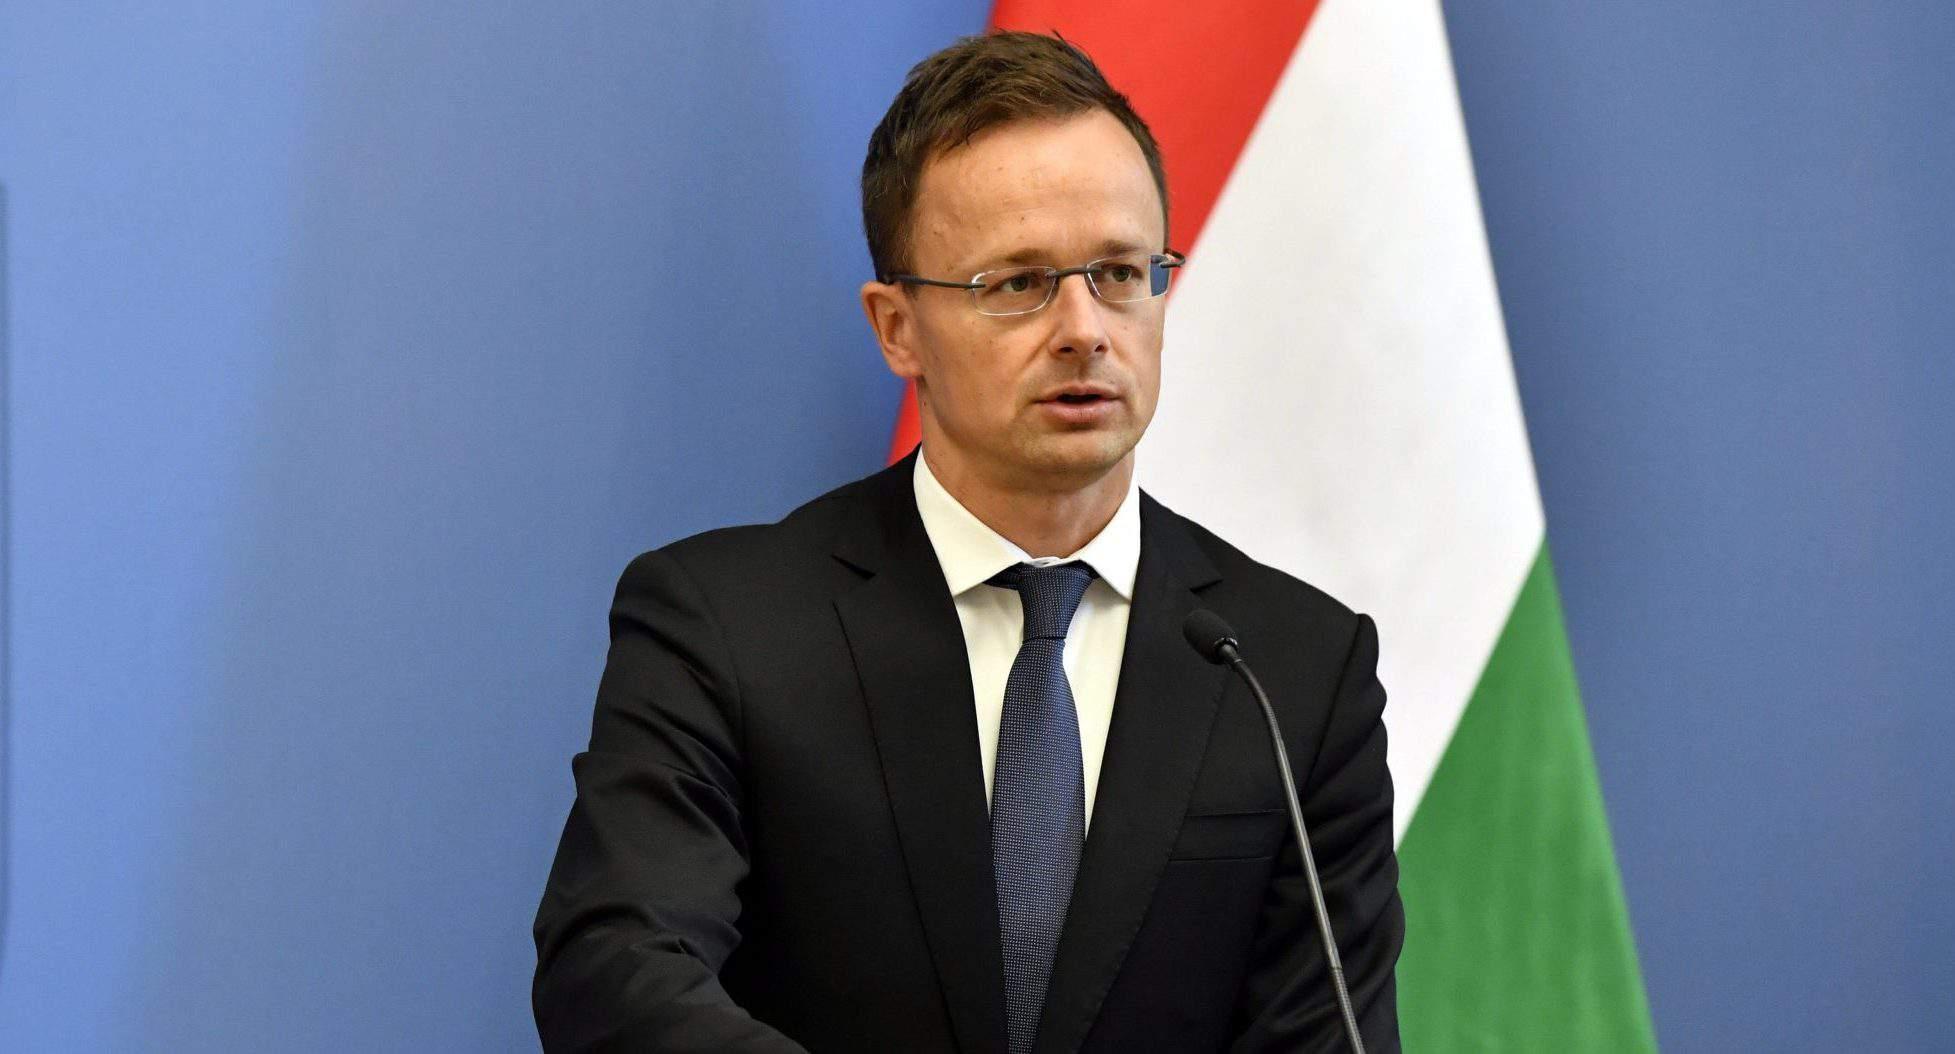 Hungarian foreign minister Szijjártó